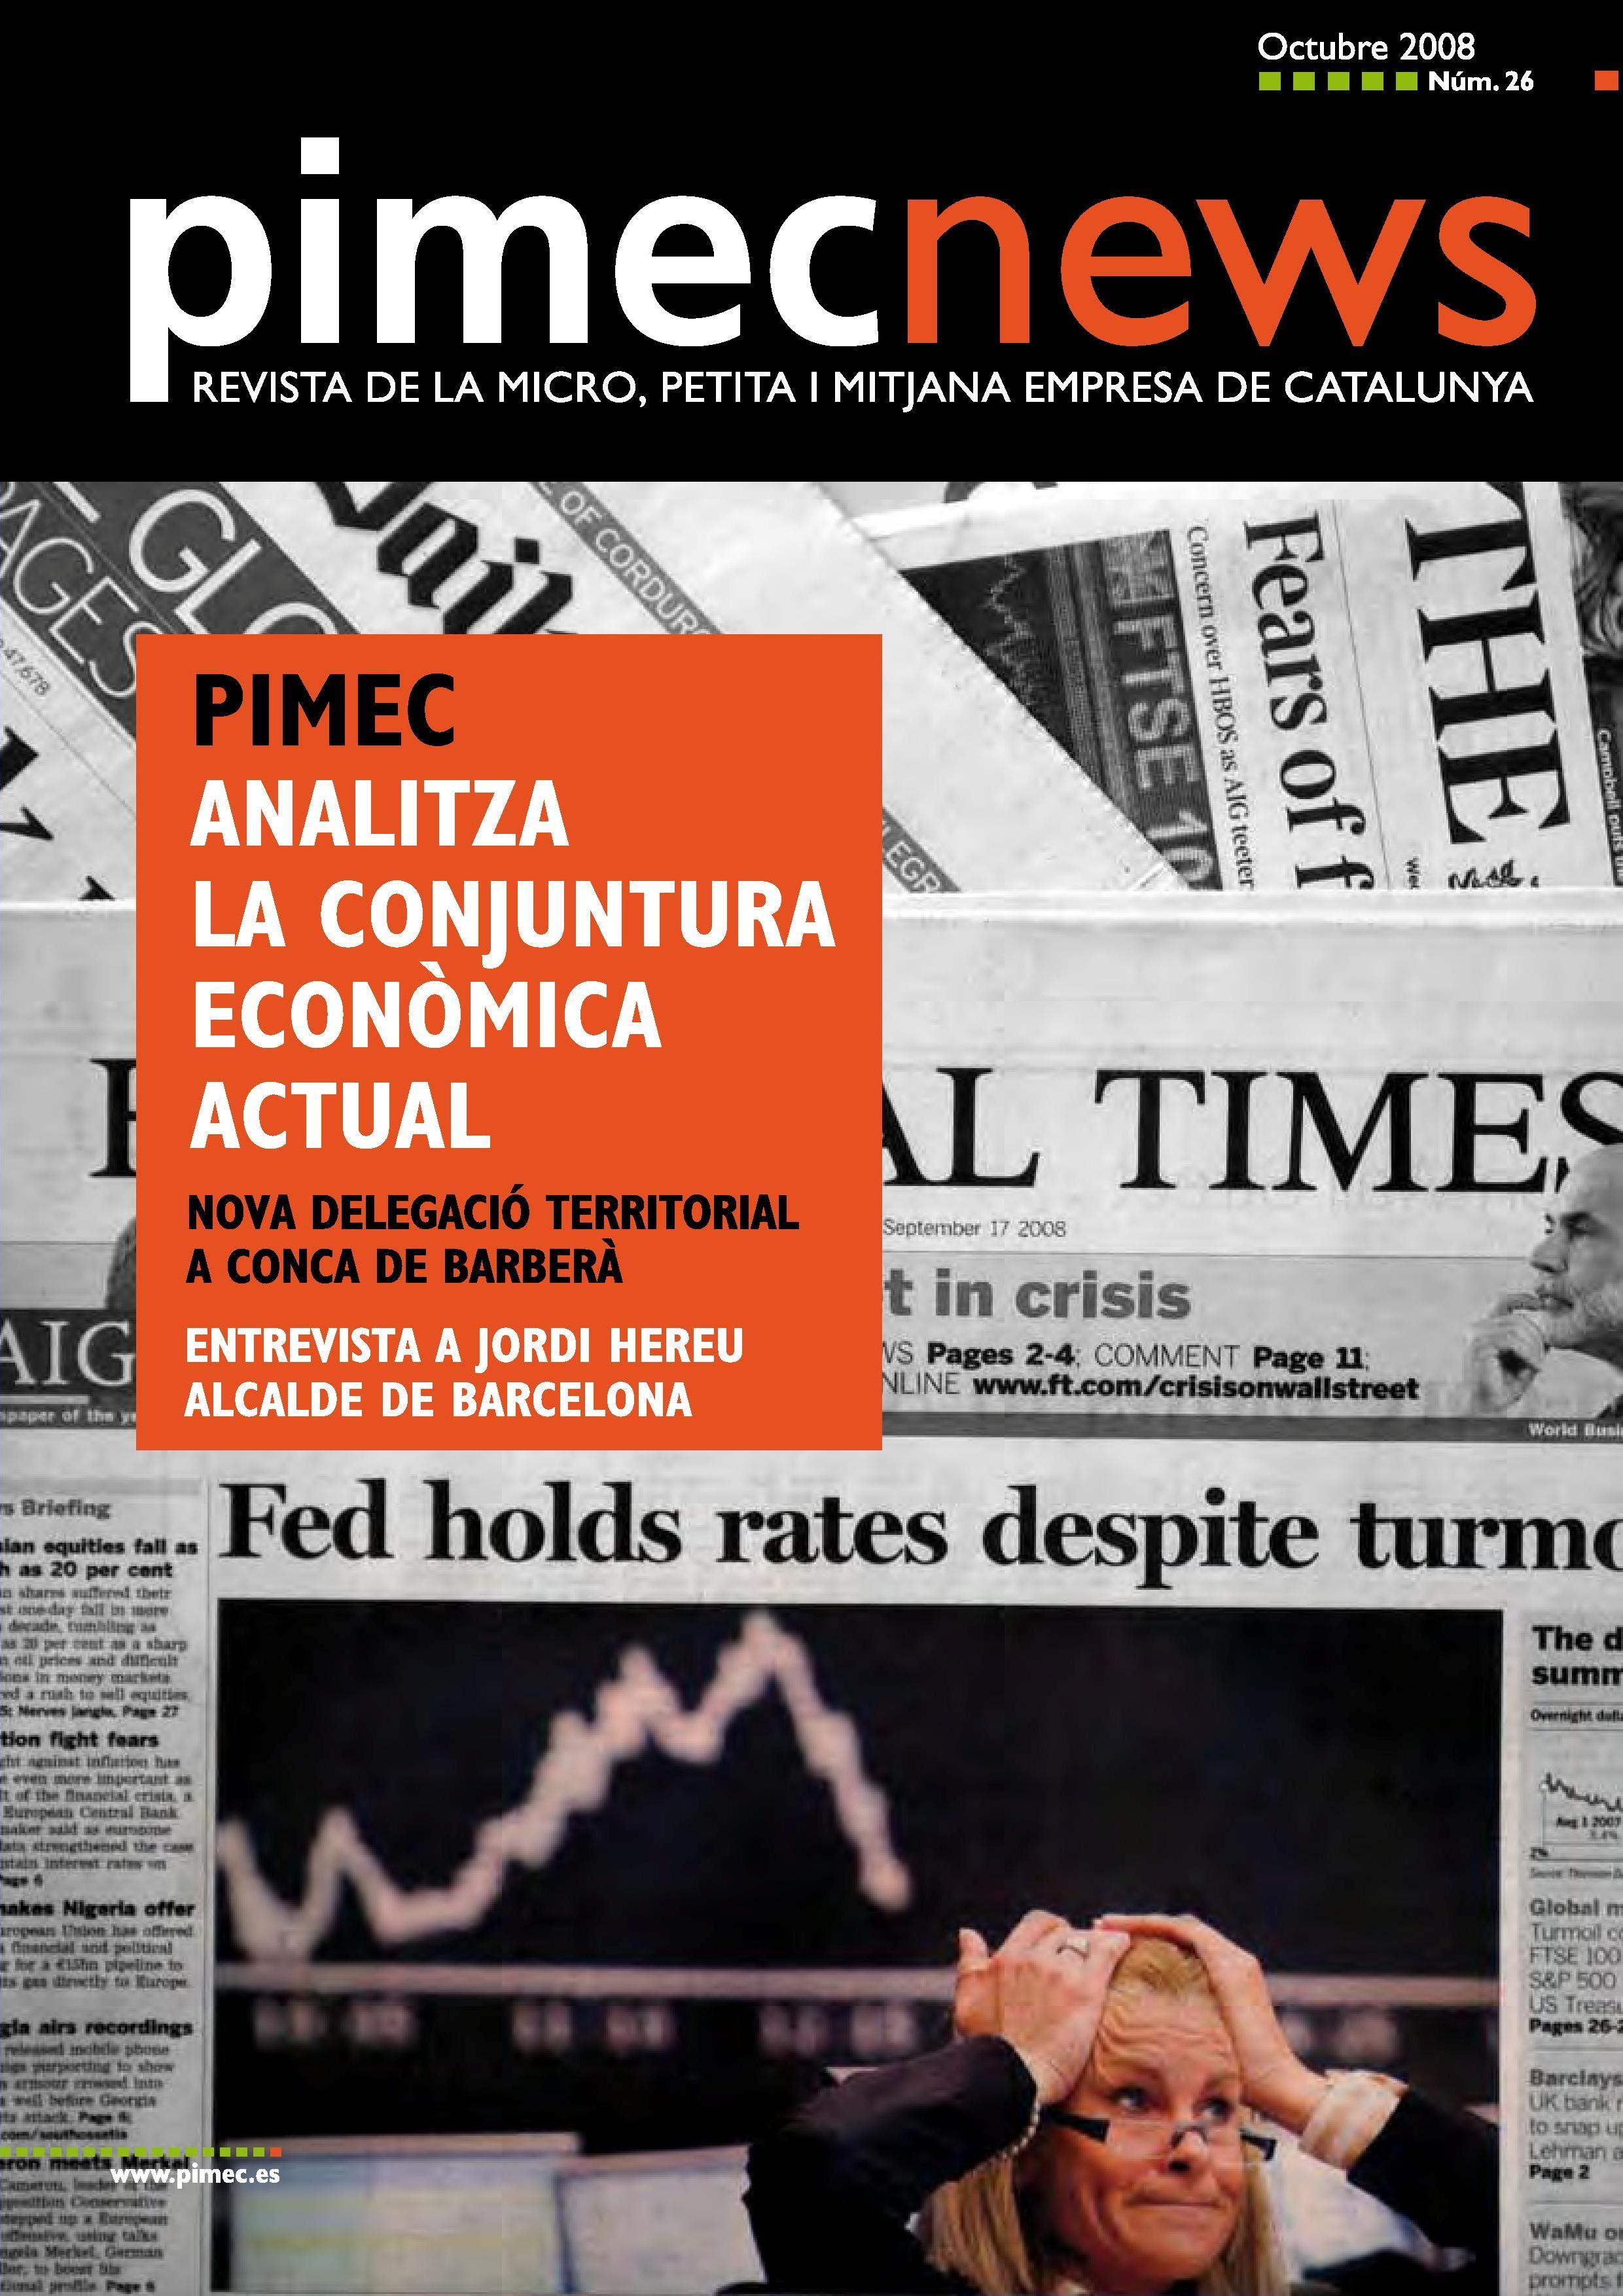 PIMEC News #26